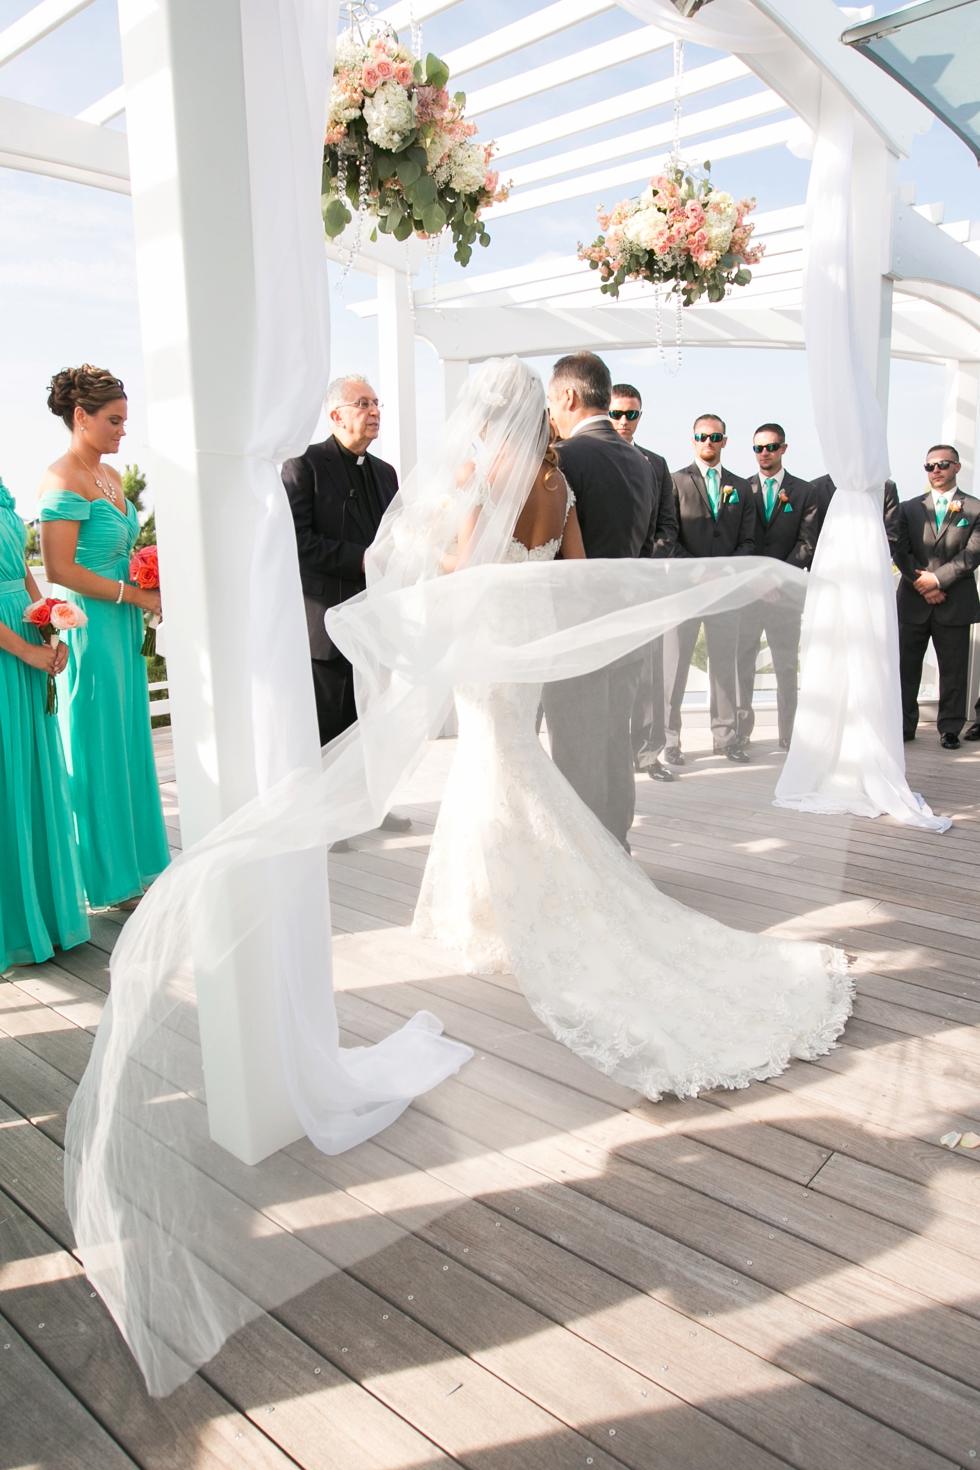 Chesapeake Bay Beach Club Rooftop Ceremony